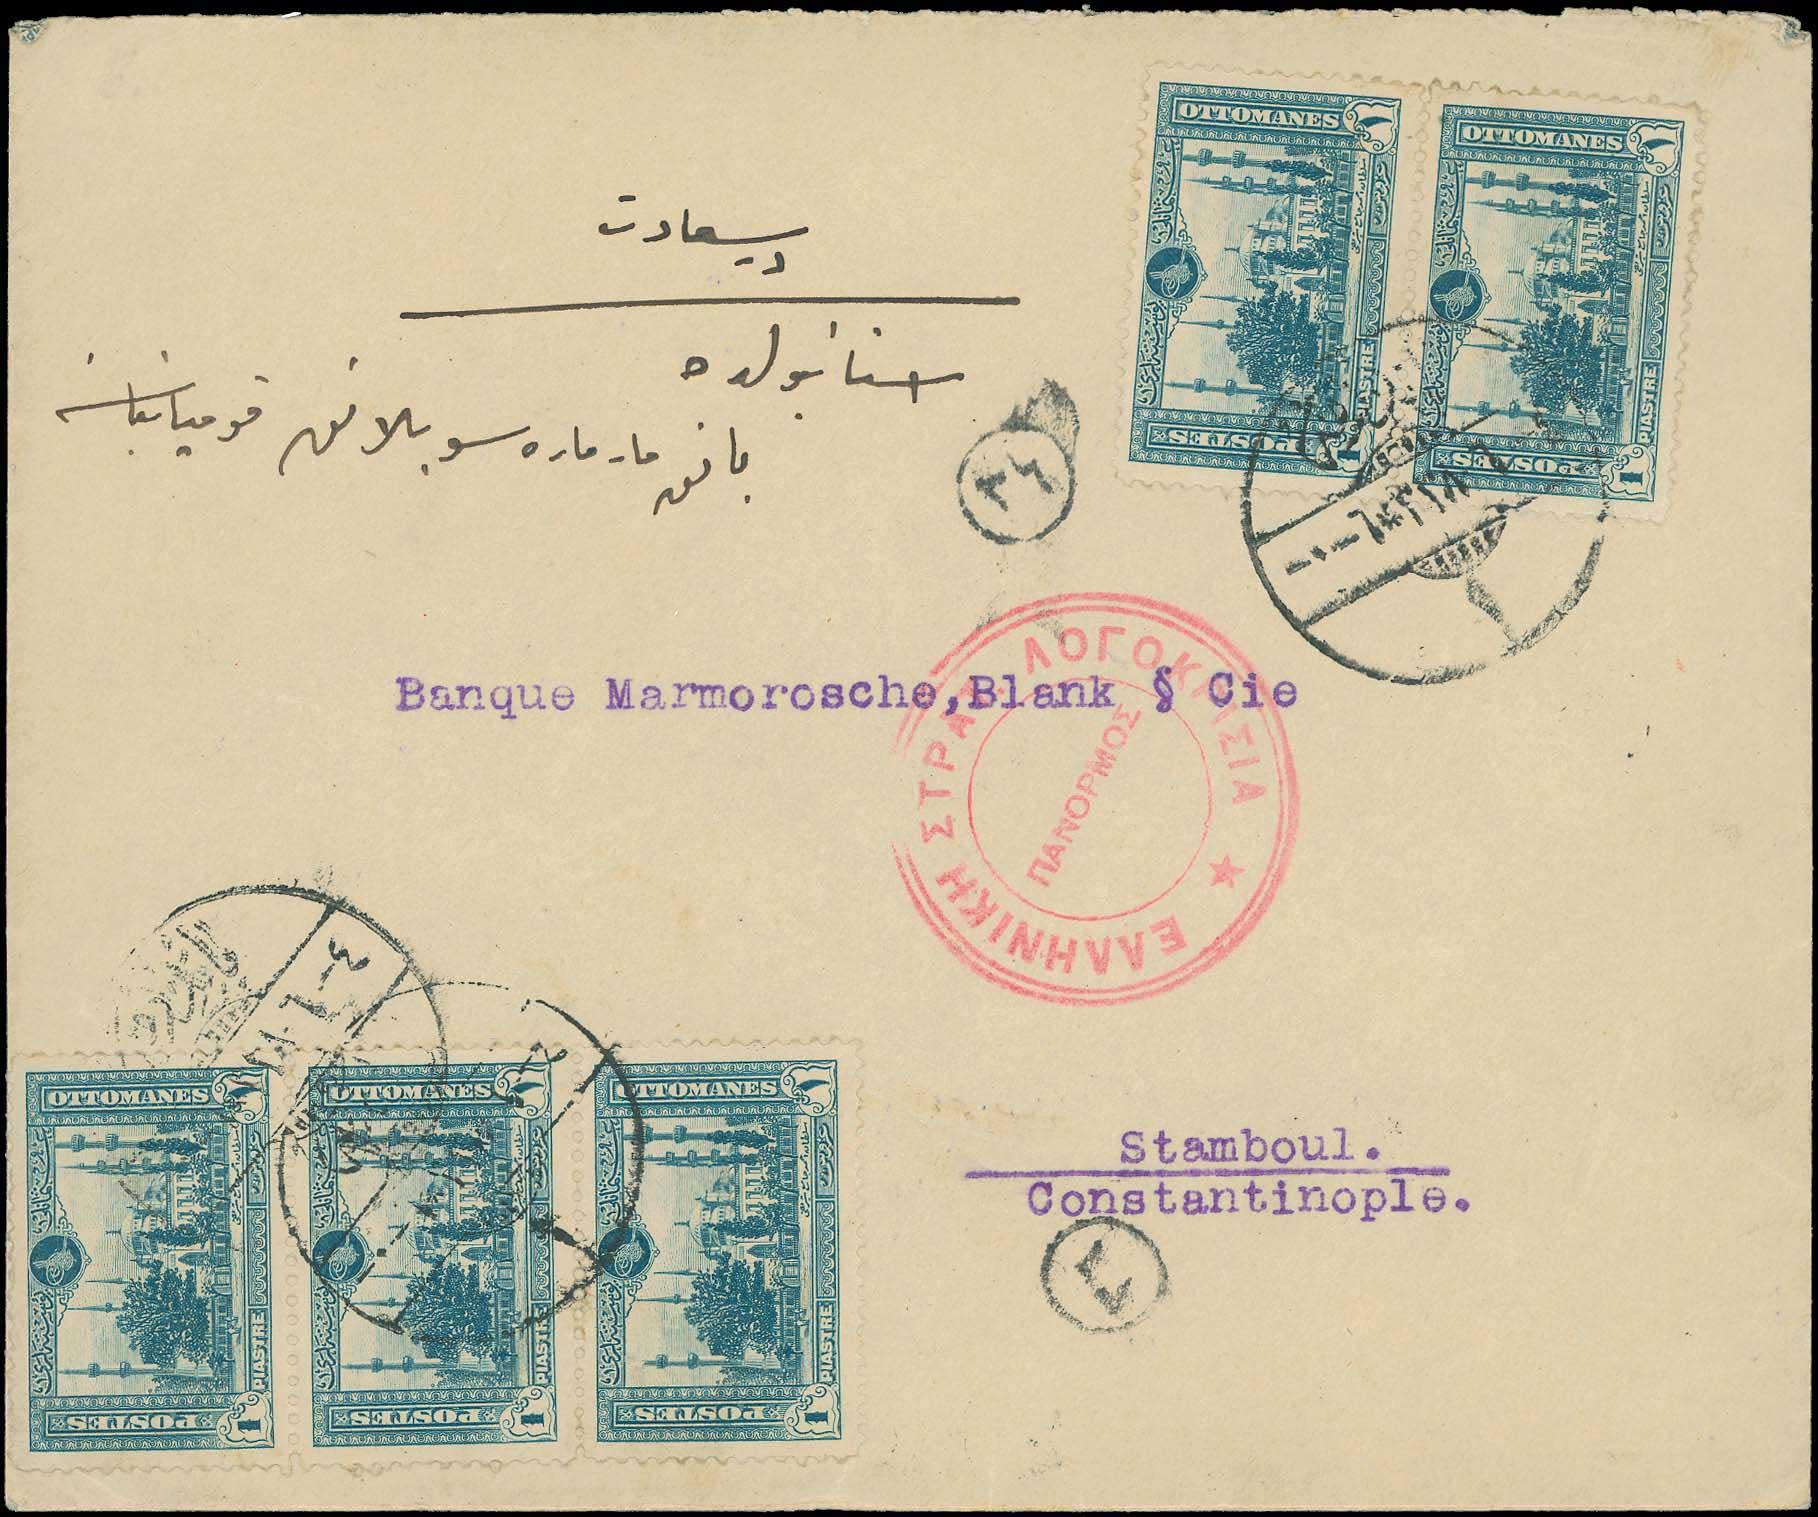 Lot 871 - -  SMYRNE,CONS/PLE & ASIA MINOR (before 1922) SMYRNE,CONS/PLE & ASIA MINOR (before 1922) -  A. Karamitsos Public & Live Internet Auction 675